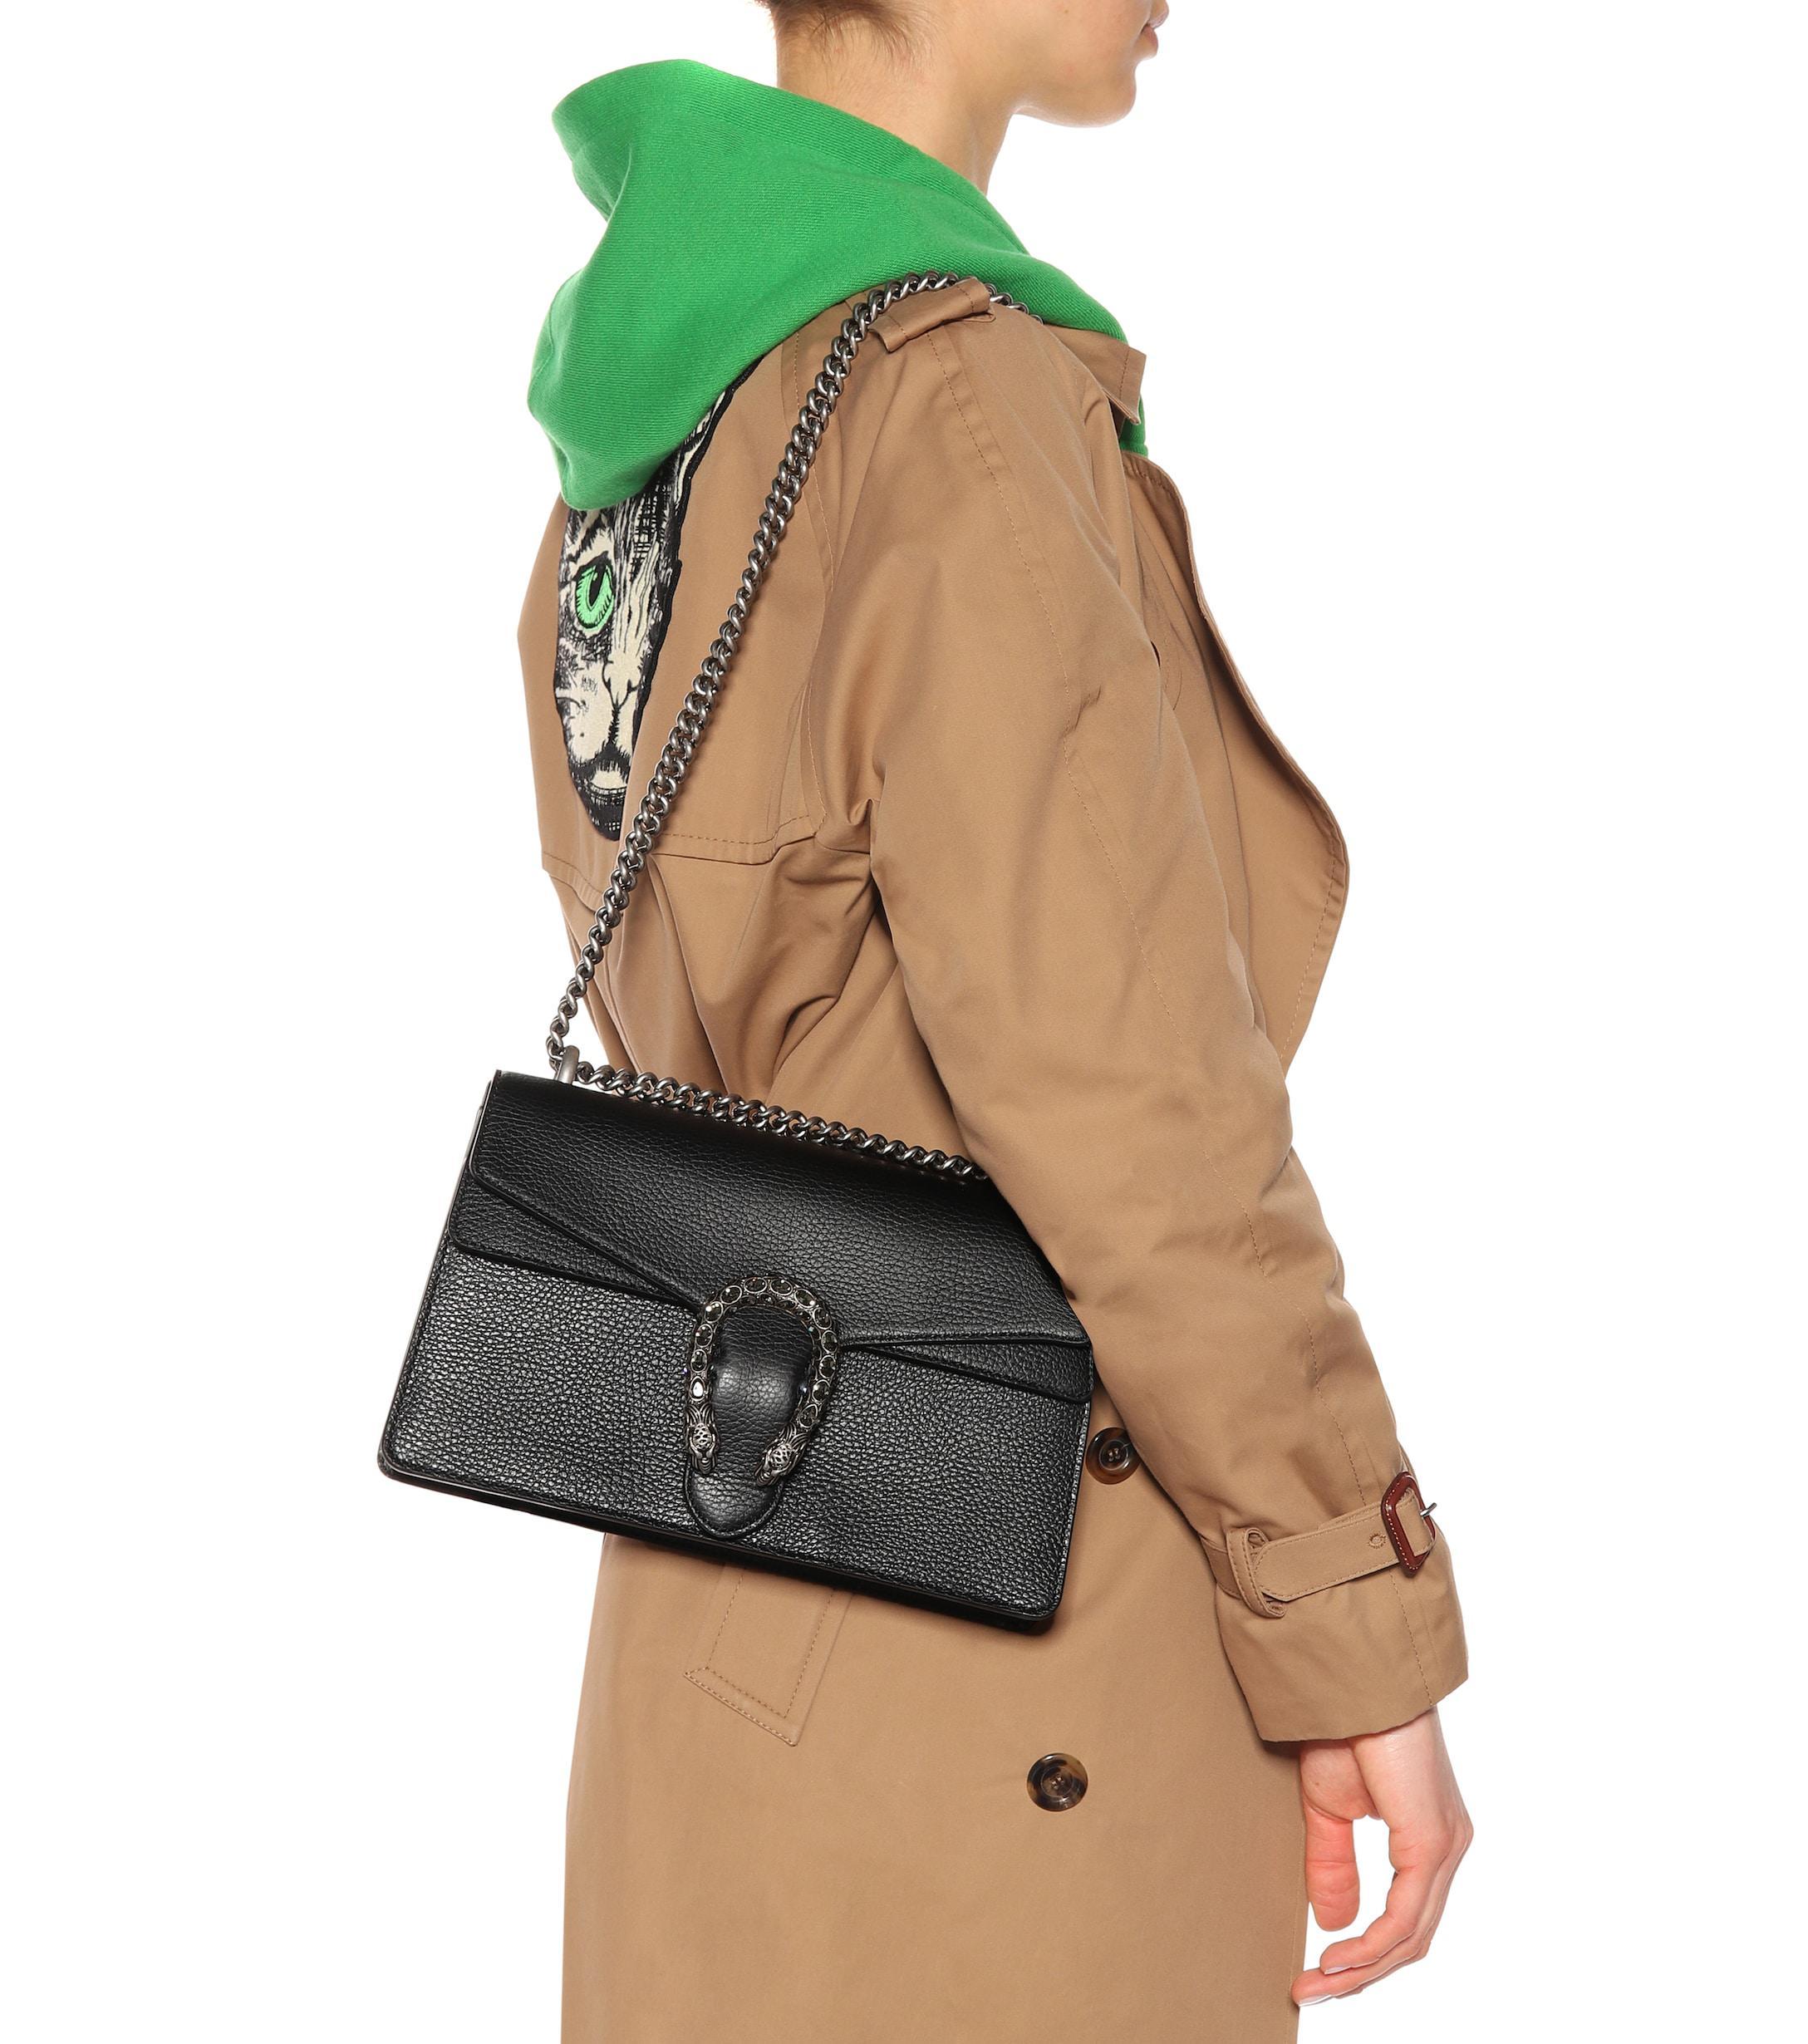 3a4cadc47 Gucci - Black Dionysus Small Leather Shoulder Bag - Lyst. View fullscreen